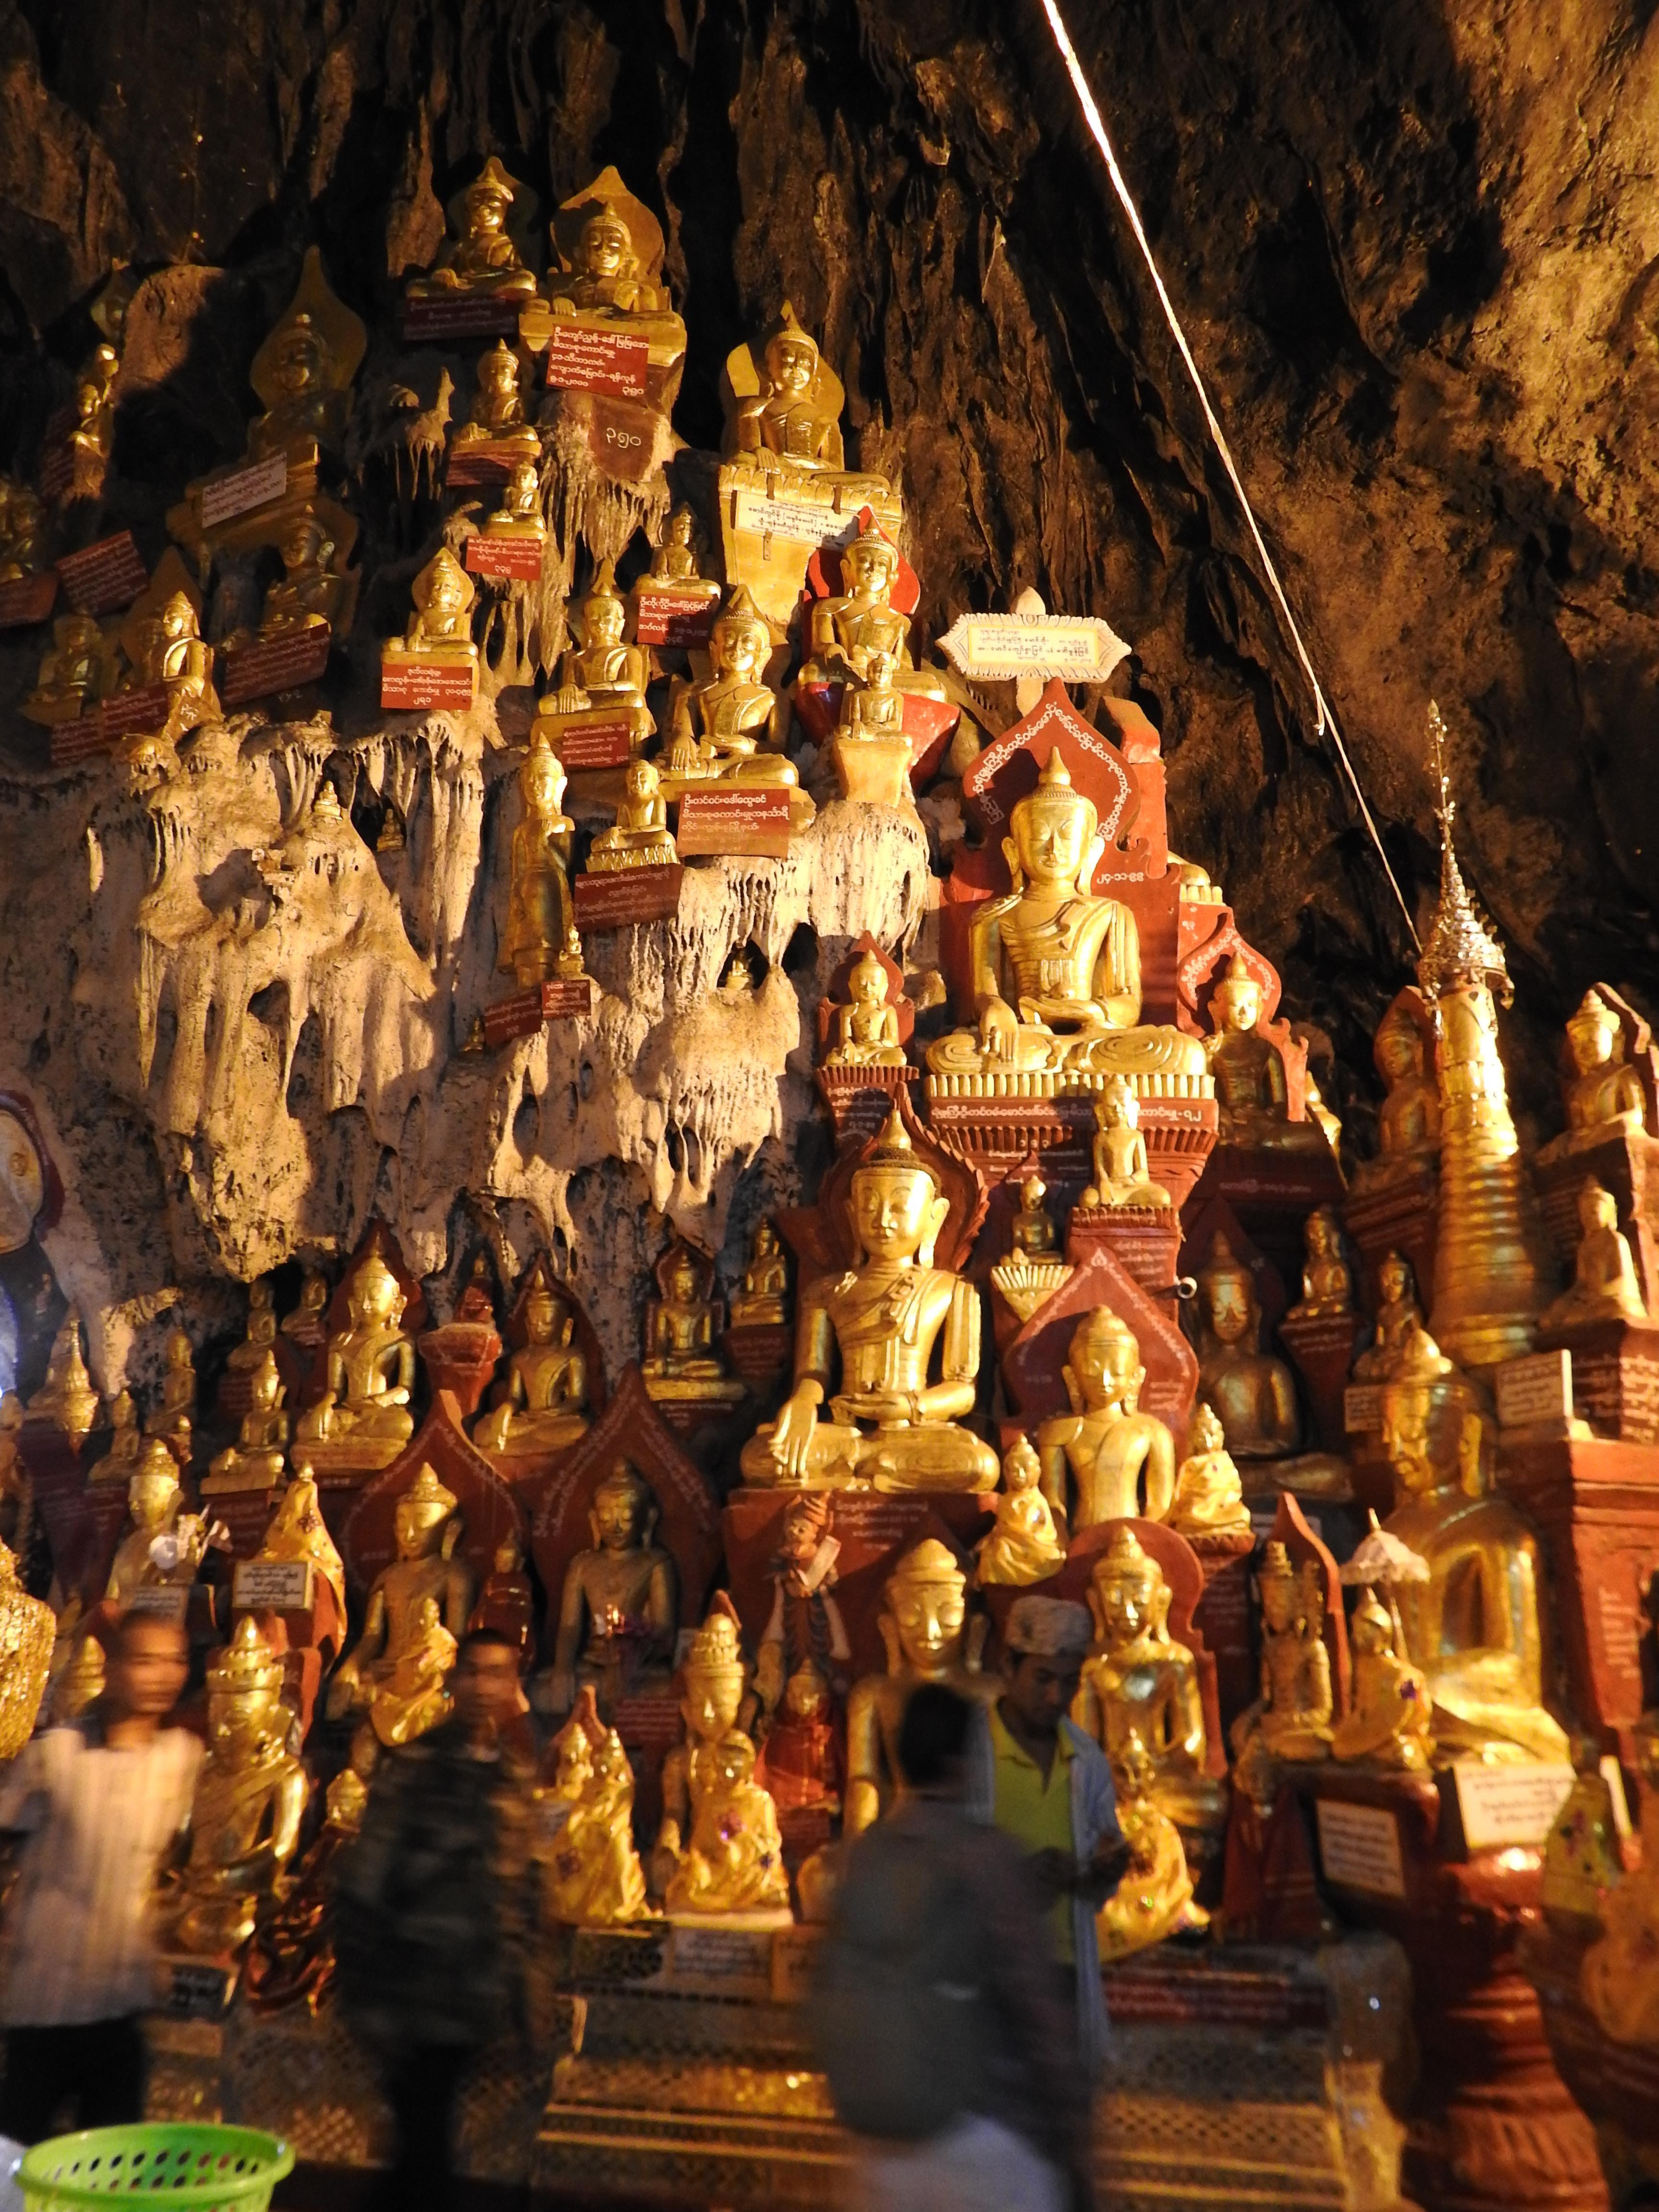 Lot of Buddhas.jpg